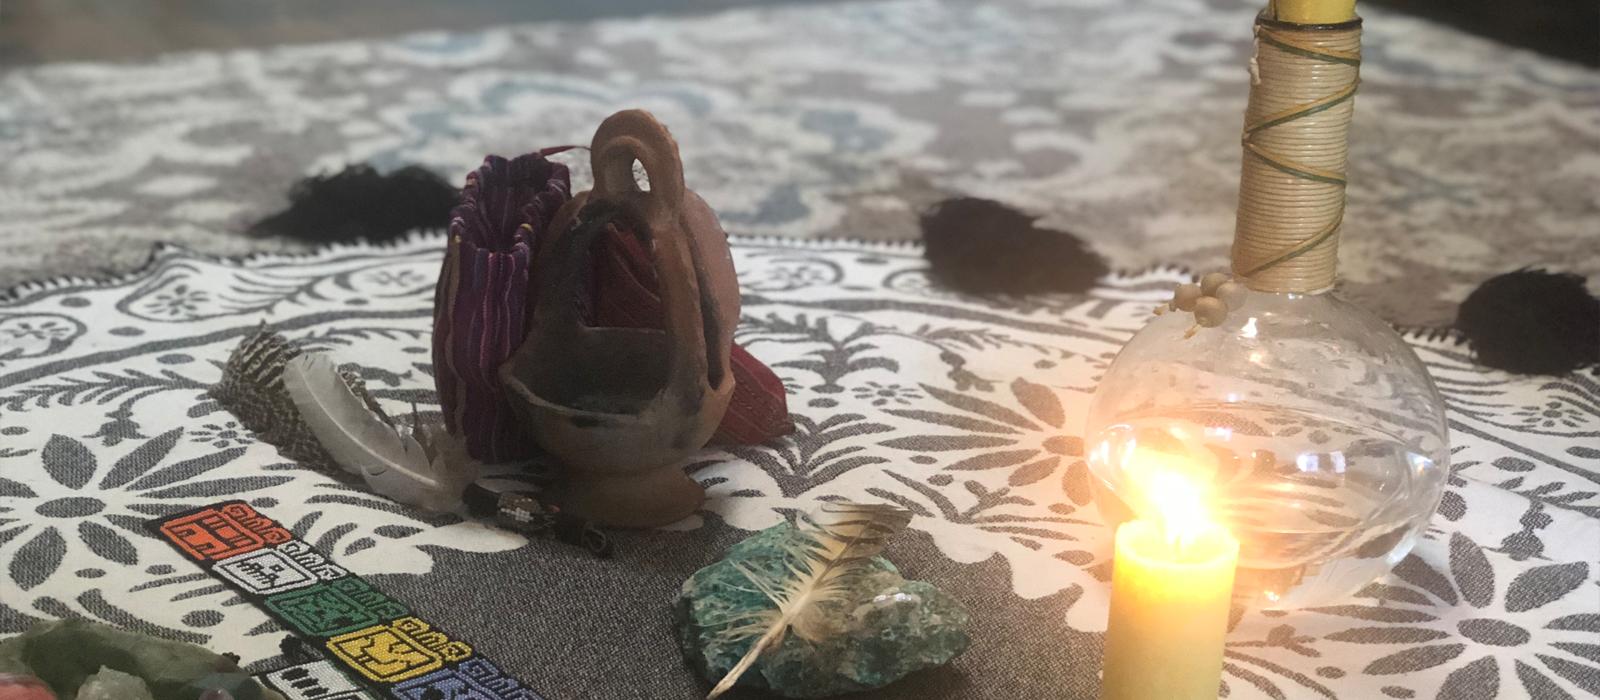 mayan grid ascension station ritual